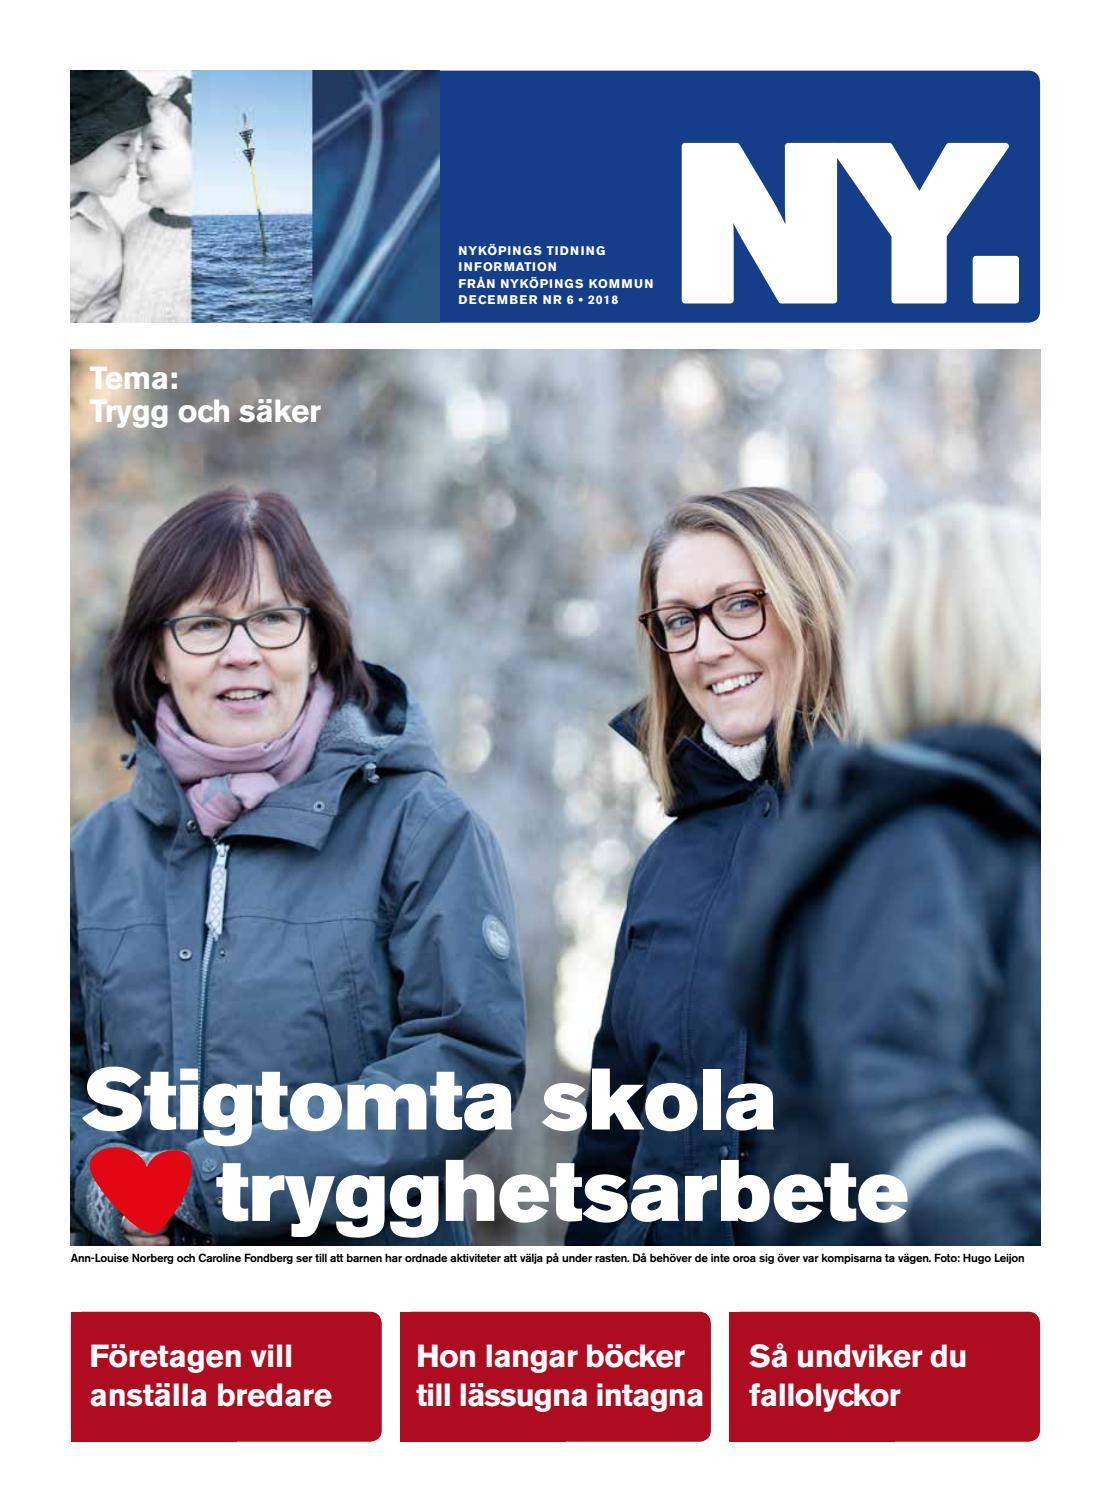 Skansberget Stigtomta Sdermanlands ln, Stigtomta - omr-scanner.net